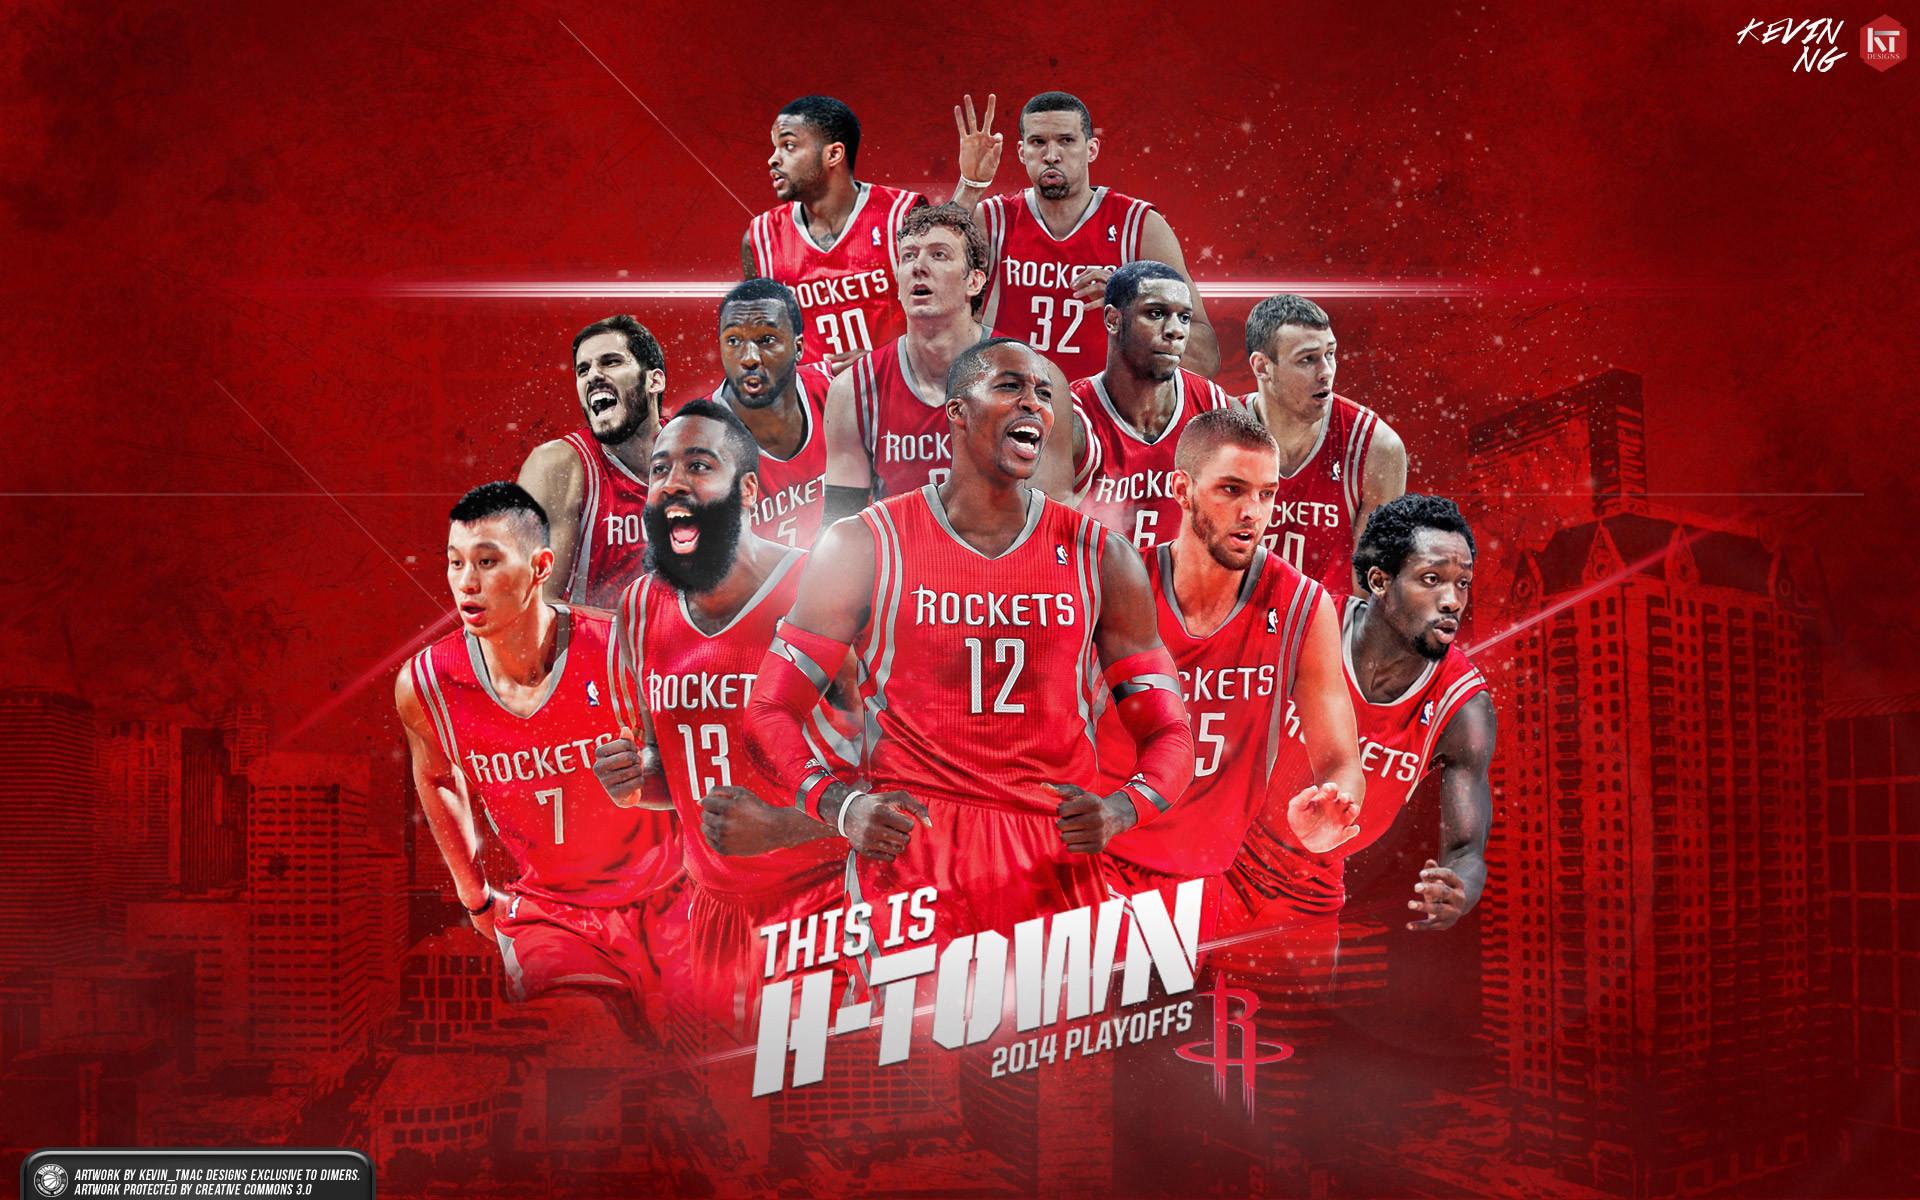 Houston Rockets 2014 NBA Playoffs Wallpaper